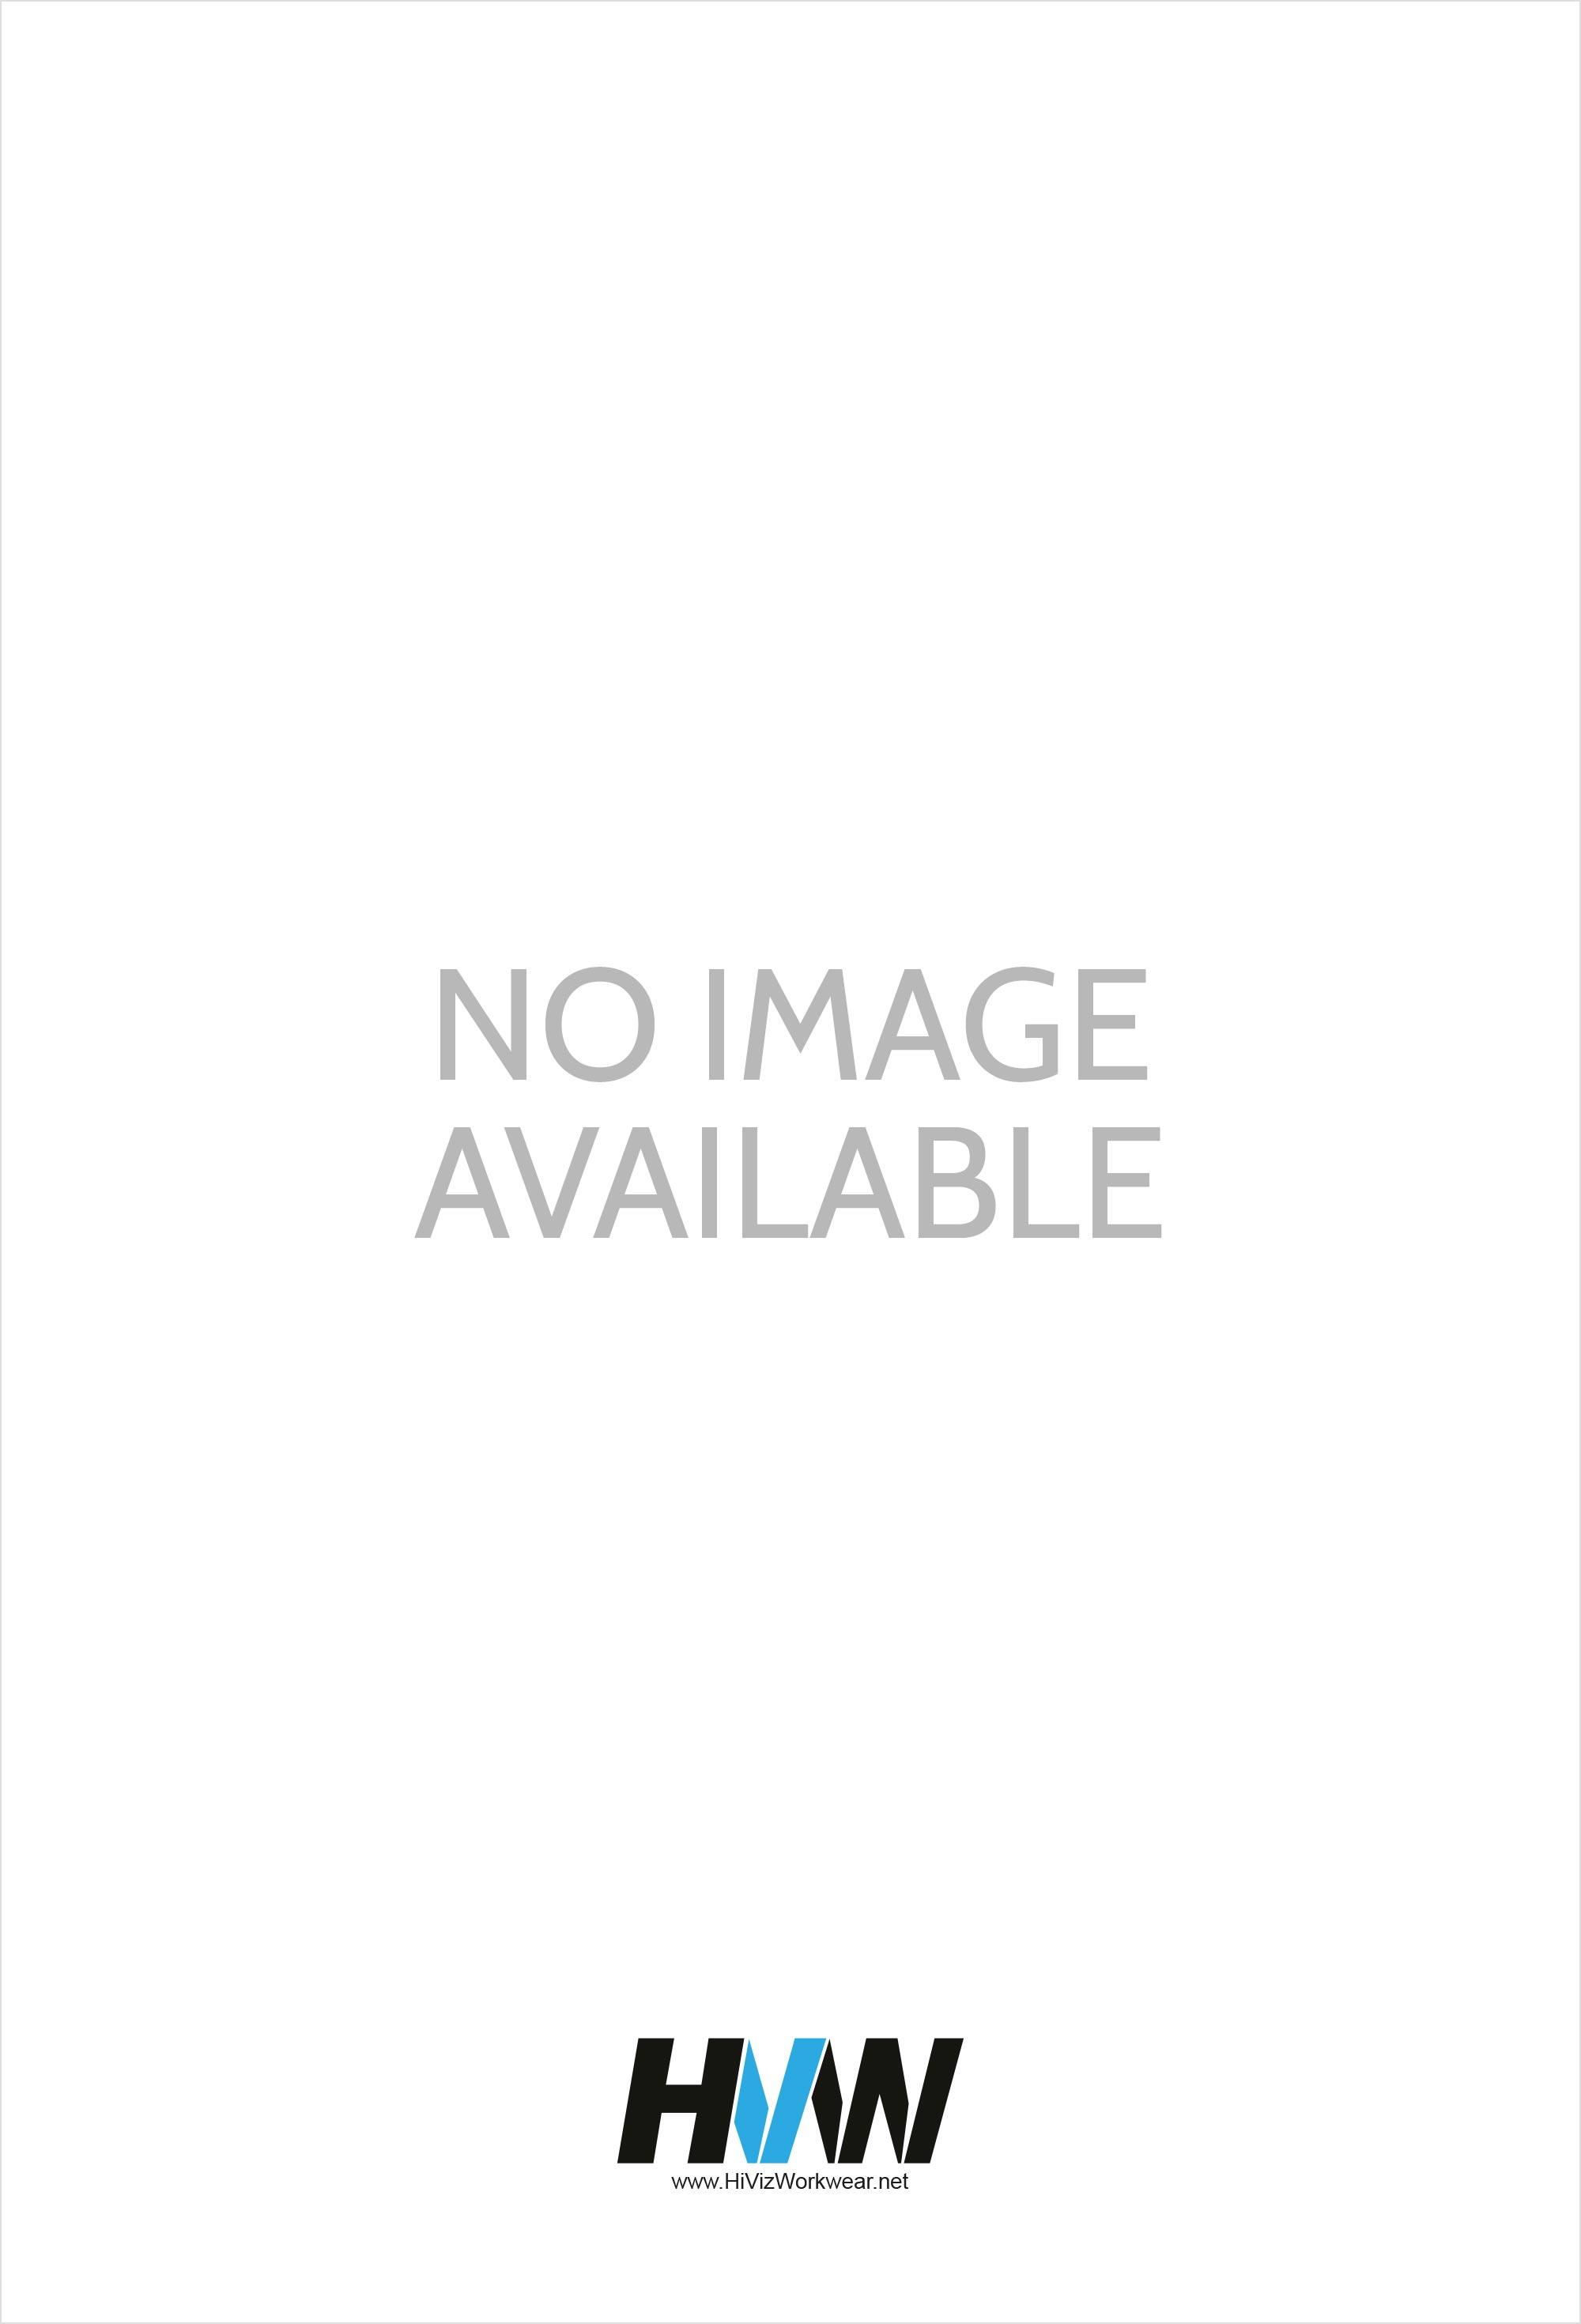 KK100 Workforce Short Sleeve Shirt  (S To 3XL)  3 COLOURS